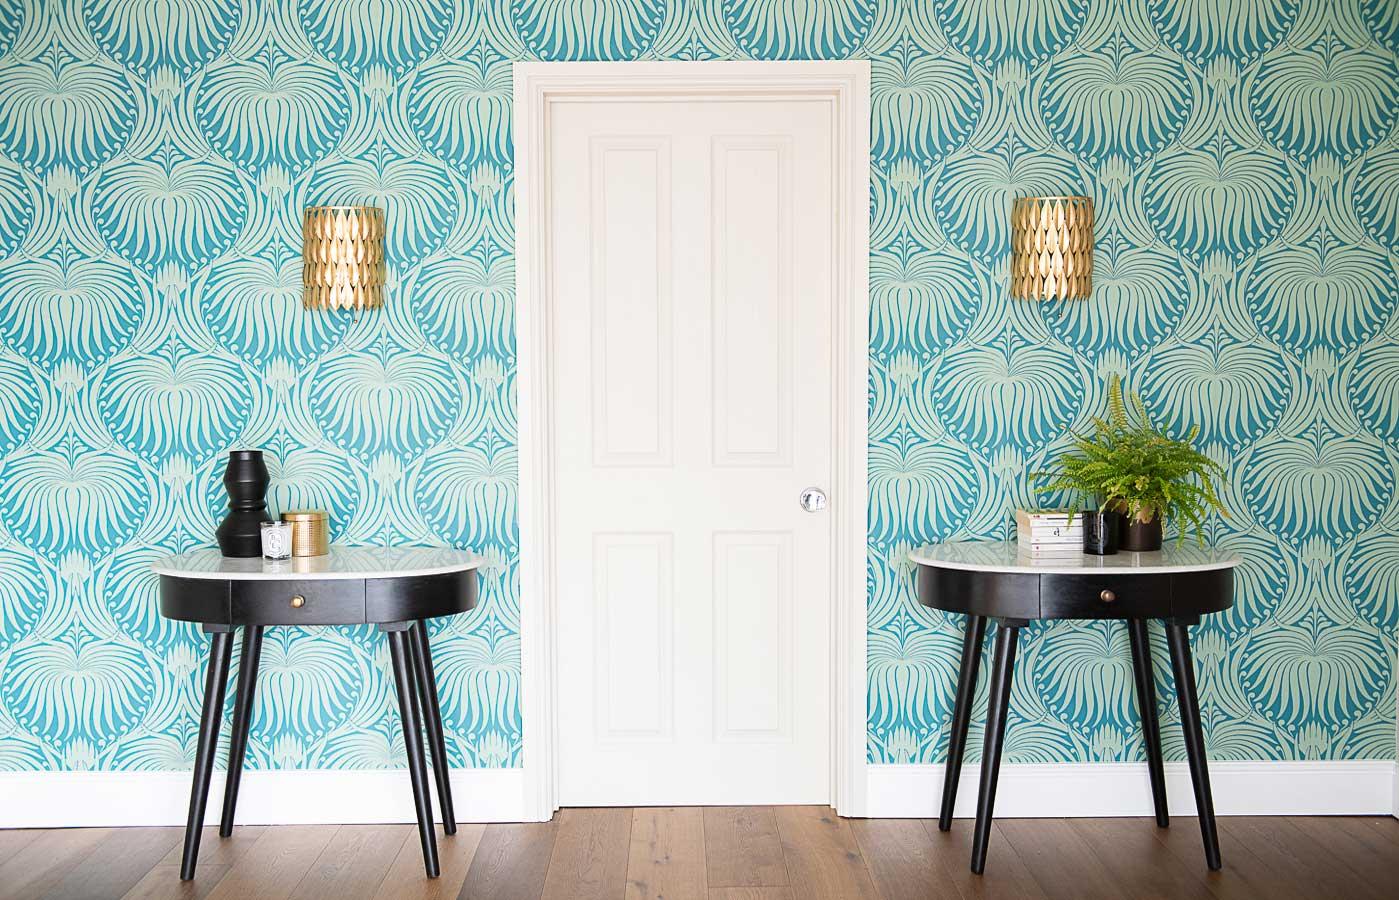 Interior-Design_Wallpaper-inspiration